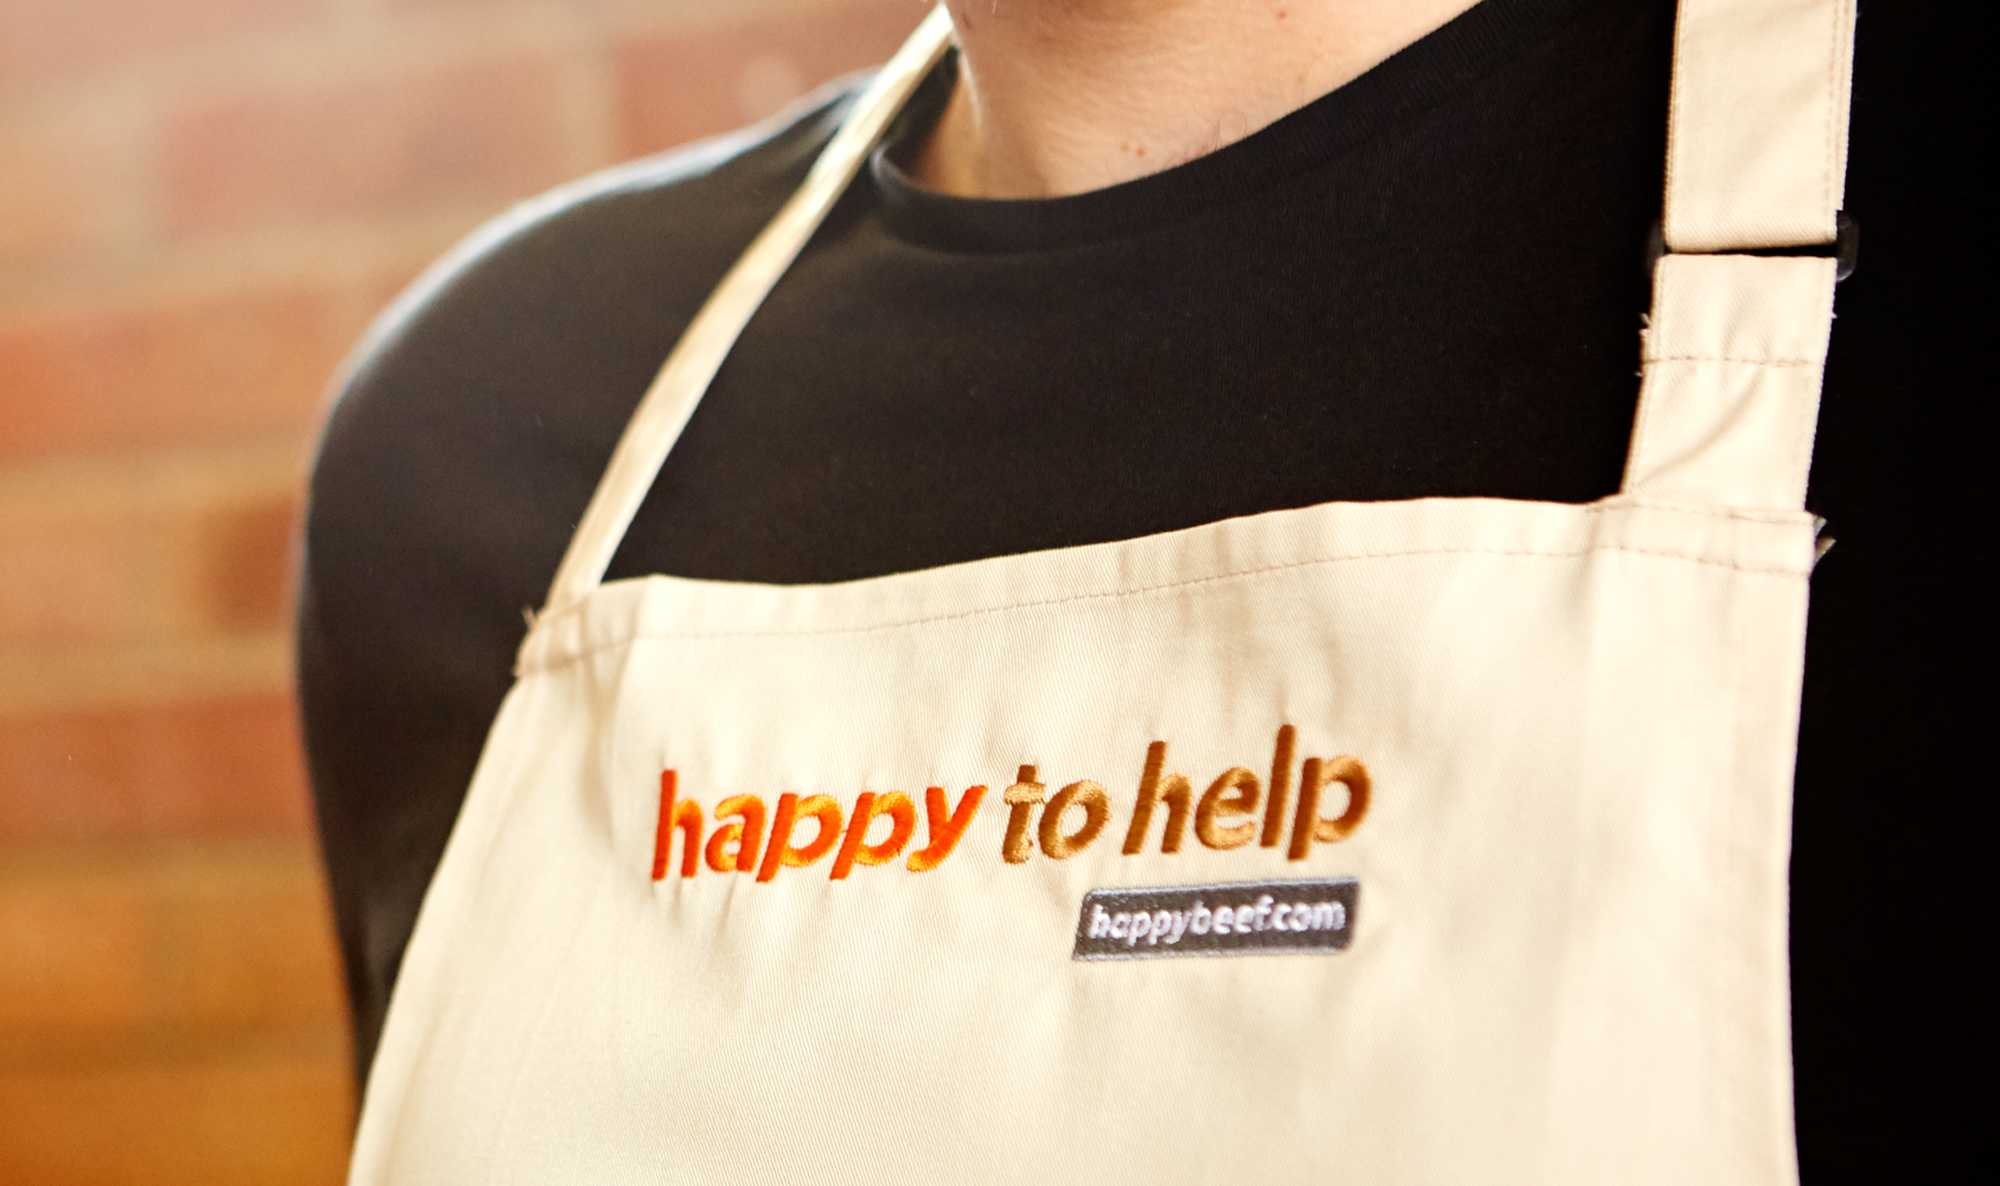 HB-Happytohelp2